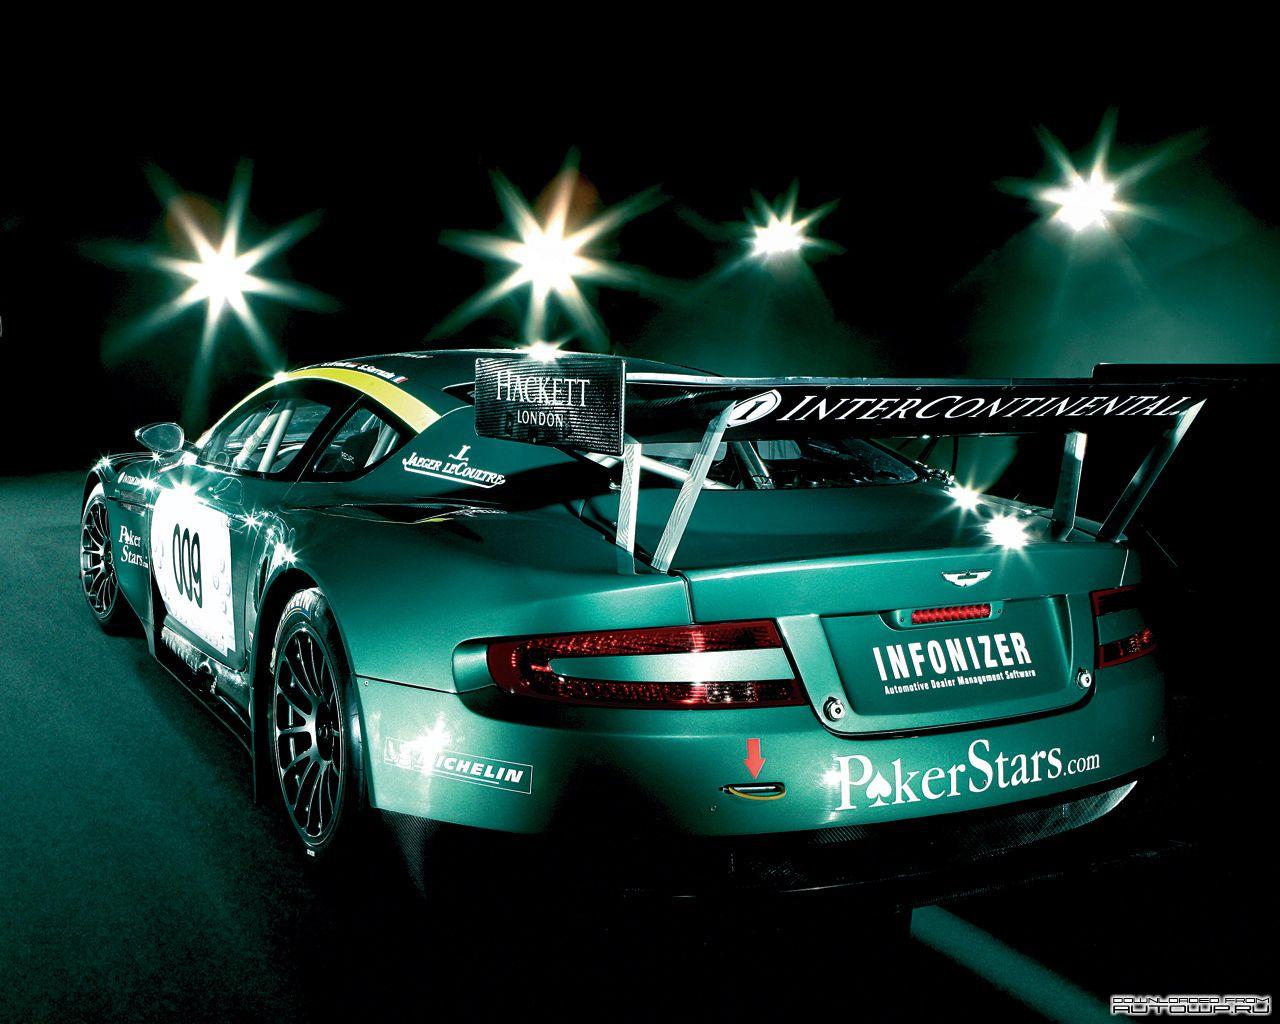 I Love The Airiness To This Desktop Hd Car Wallpaper 1280x1024 Car Wallpapers 3d Wallpaper Aston Martin Cars